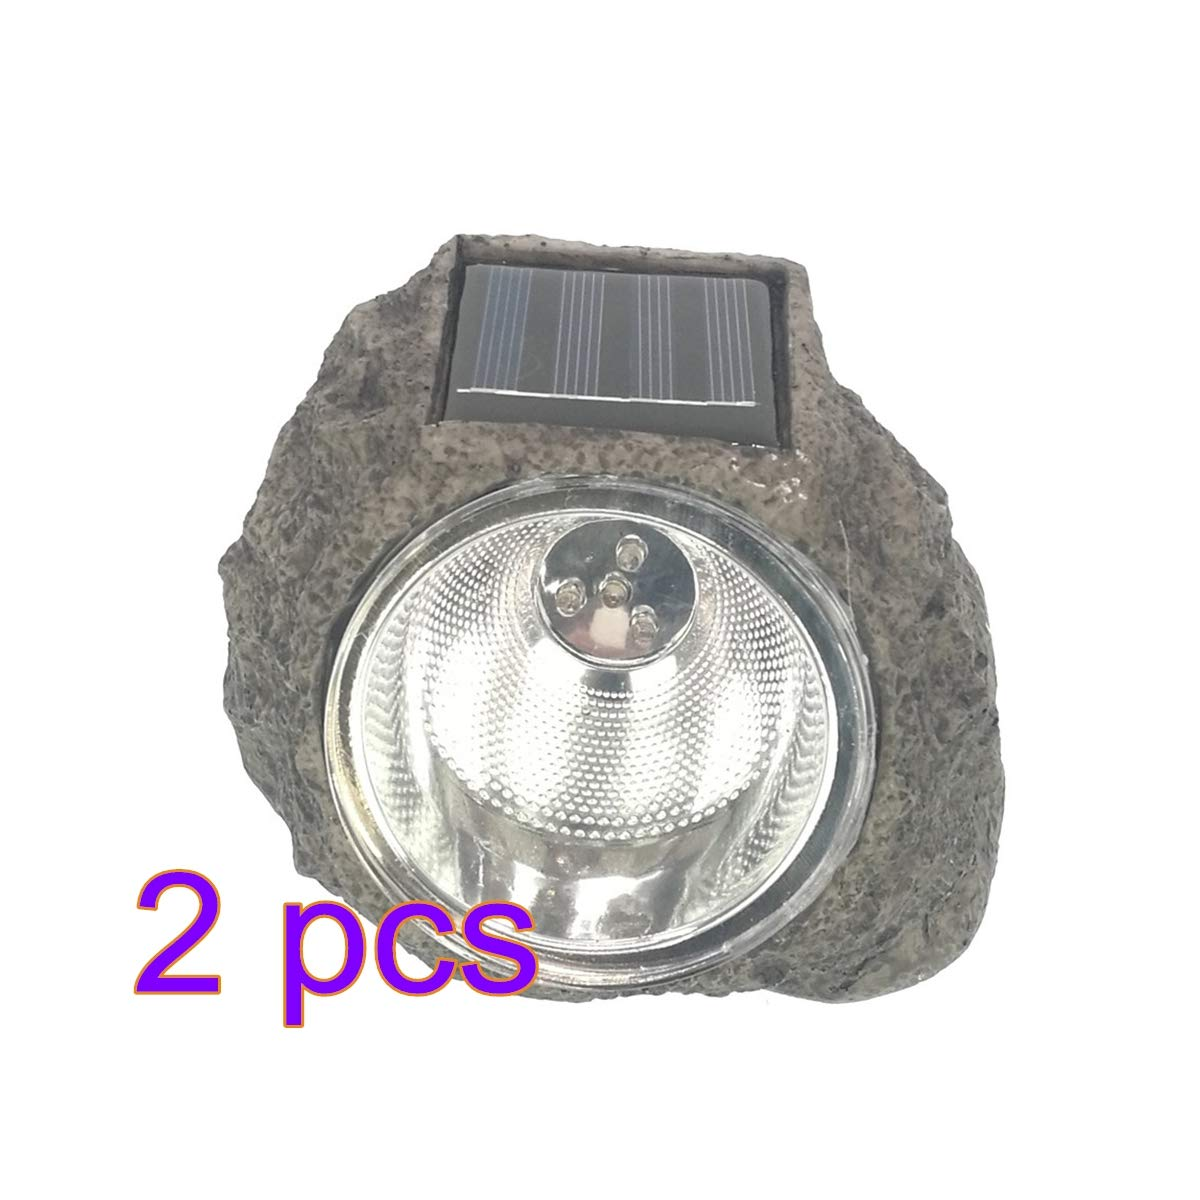 OSALADI Energ/ía solar Resina decorativa Piedra Mancha Luz Solar C/ésped Luz Decorativa Resistente al agua L/ámpara de paisaje Led para jard/ín al aire libre